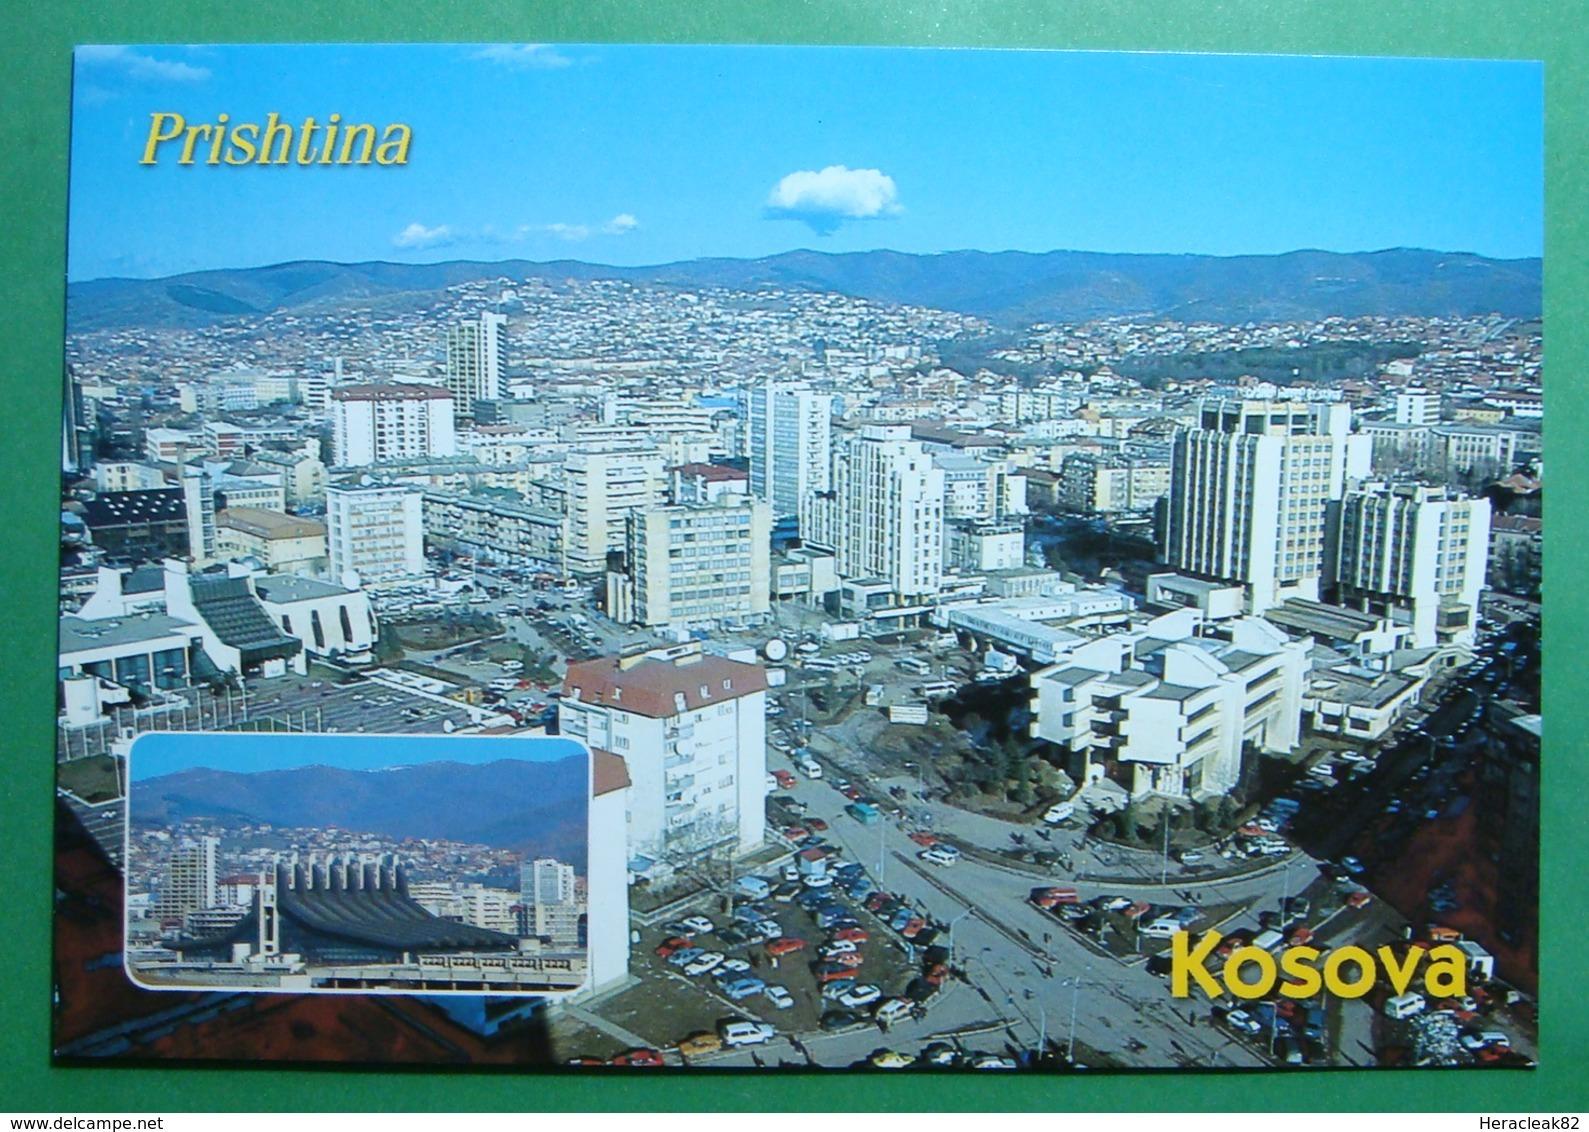 Capital City PRISTINA, Multiview, Kosovo (Serbia) New Postcards. - Kosovo